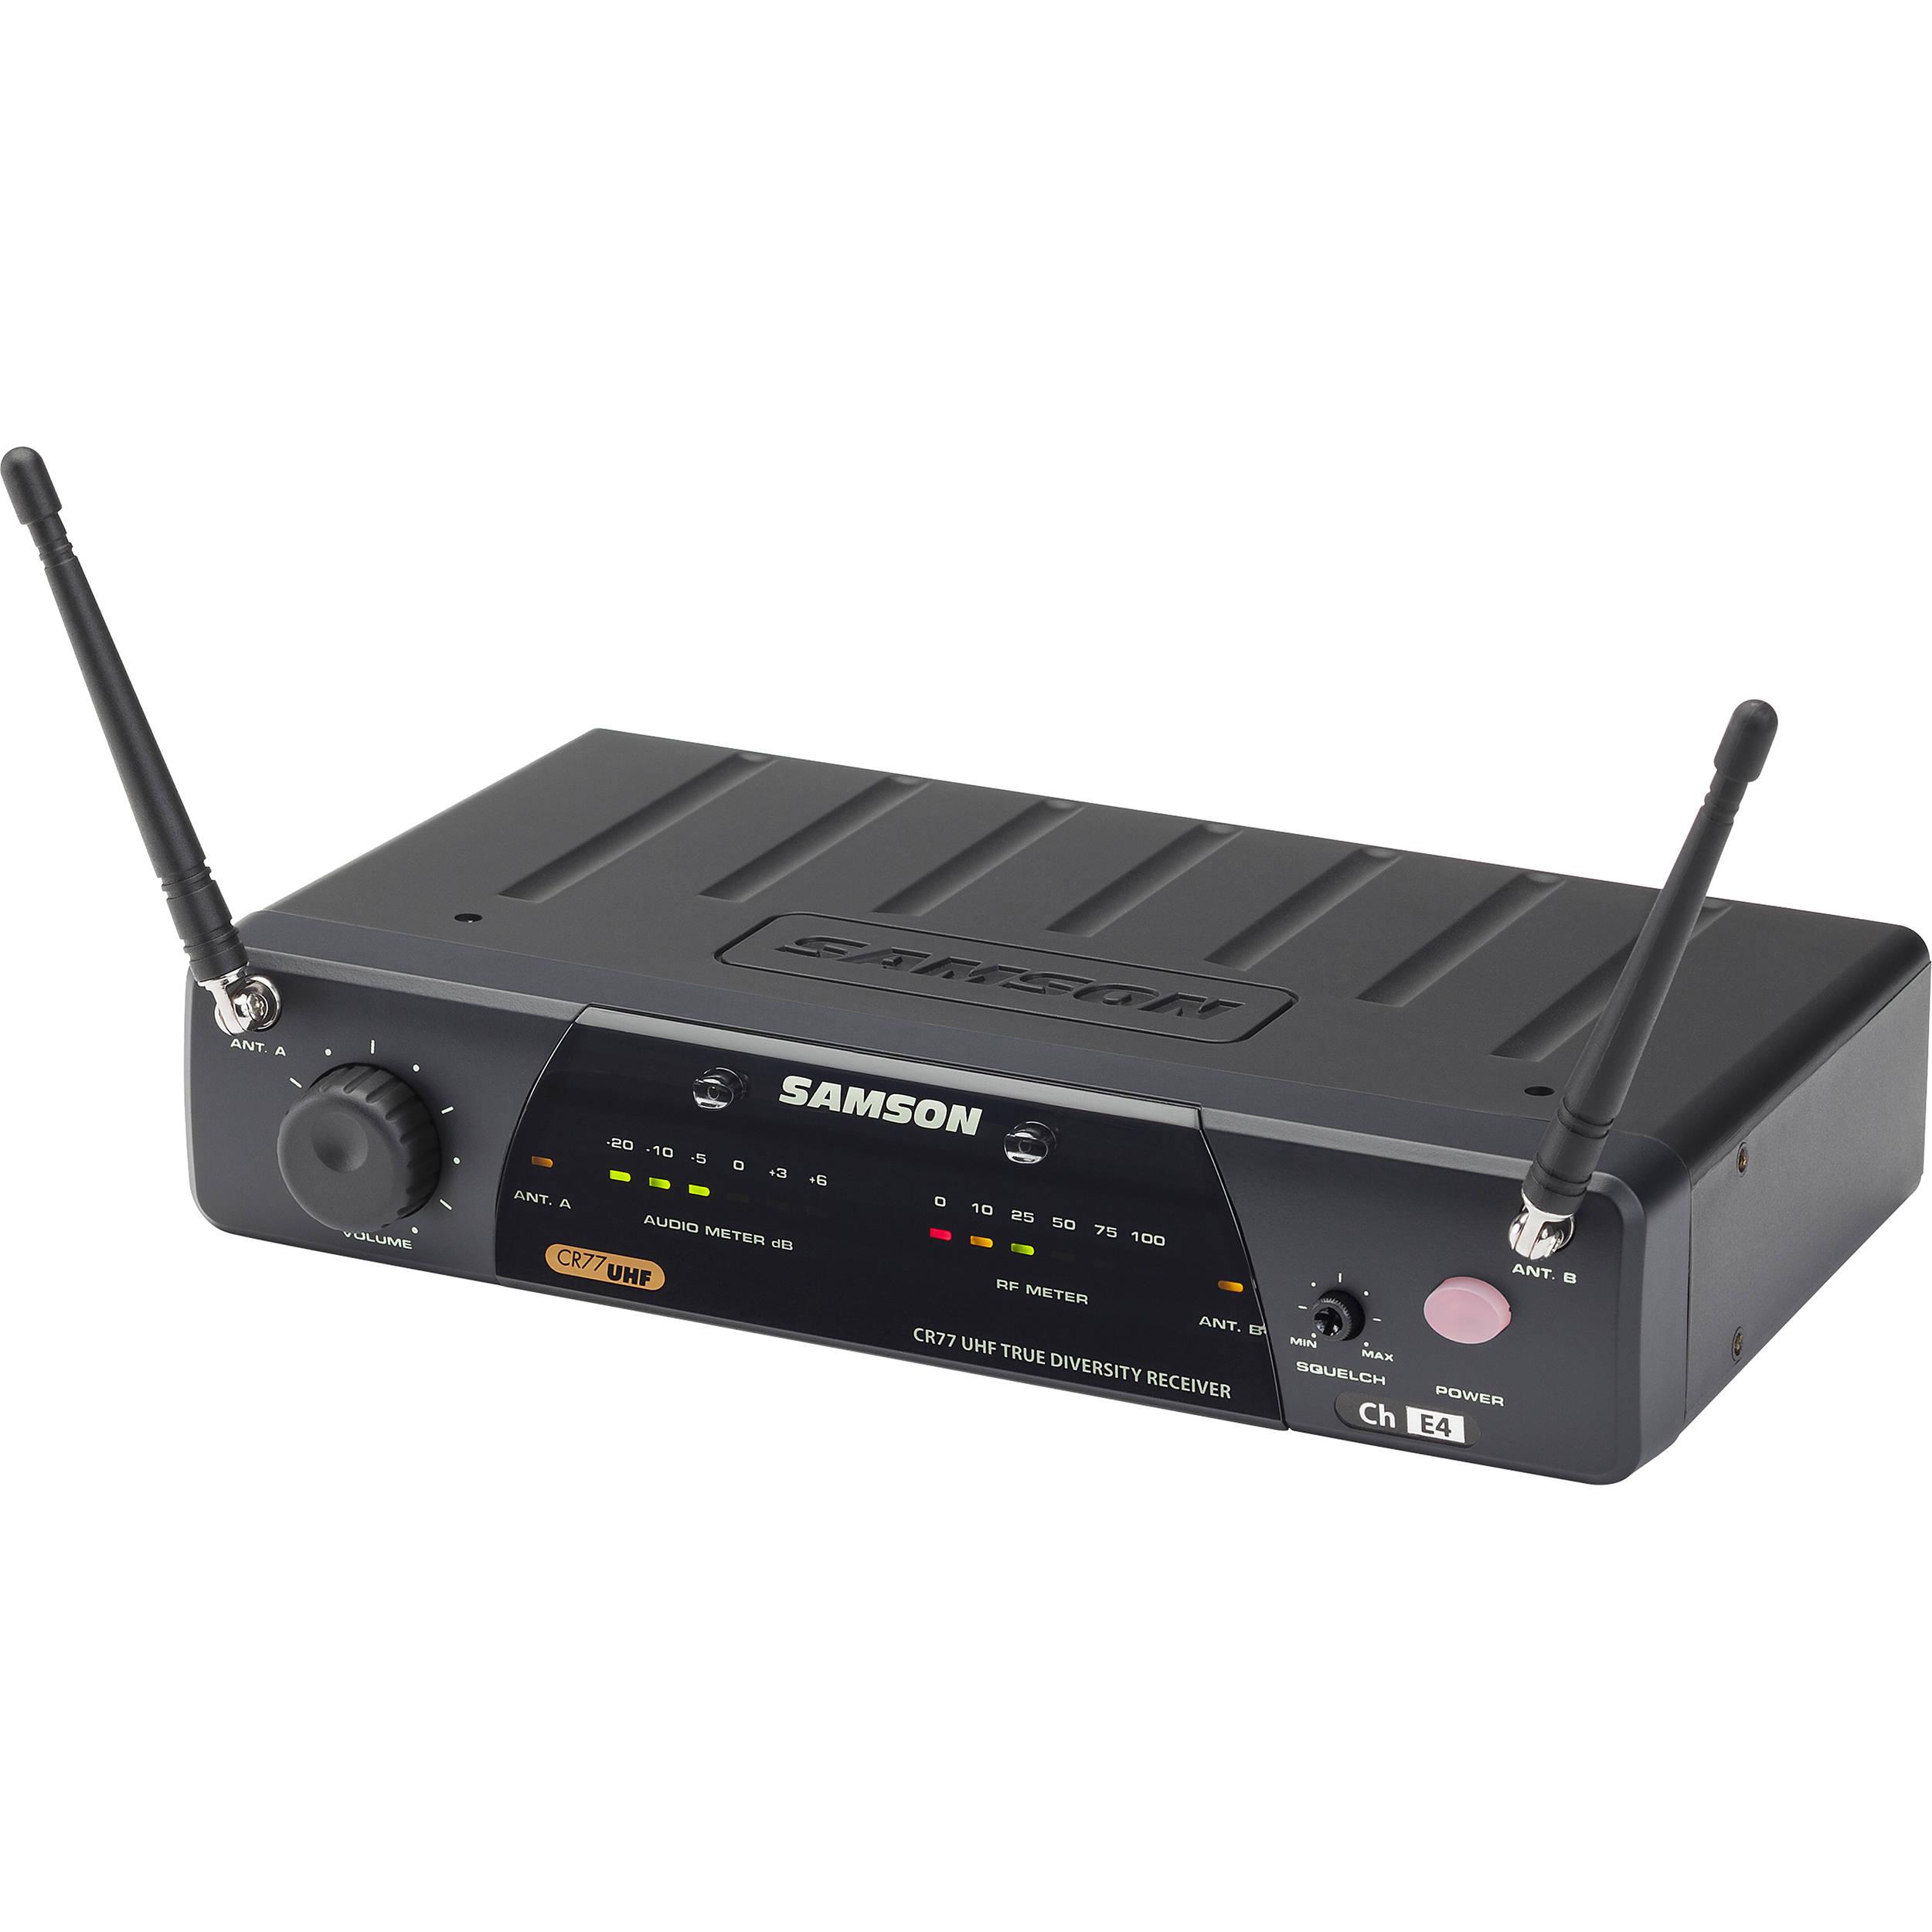 Samson AirLine 77 Wireless AH7-Qe Fitness Pilates Headset Microphone System-K2